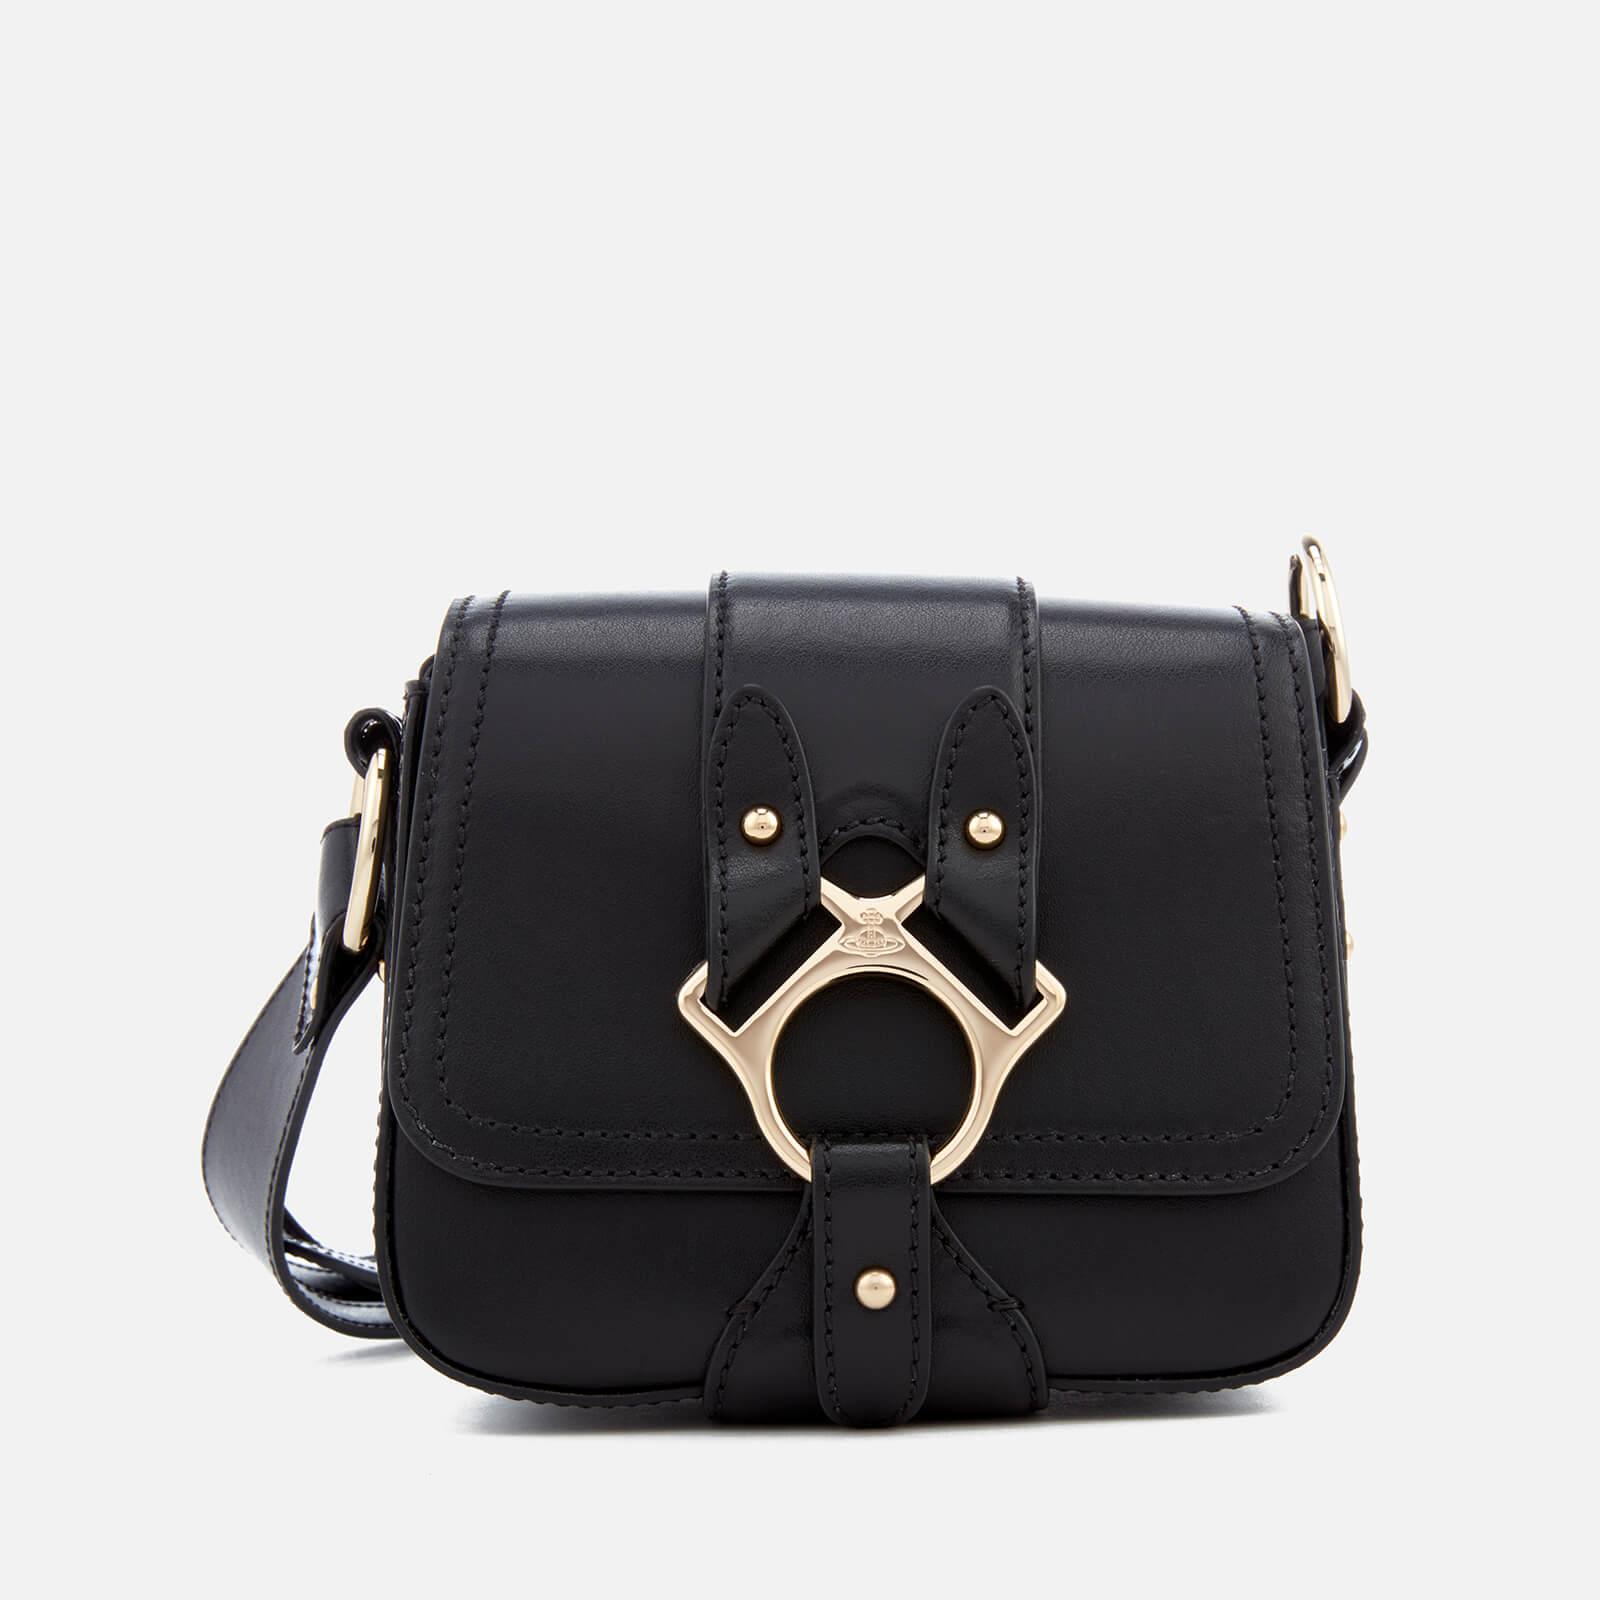 9ae8a712b8 ... Vivienne Westwood Women s Folly Small Saddle Bag - Black